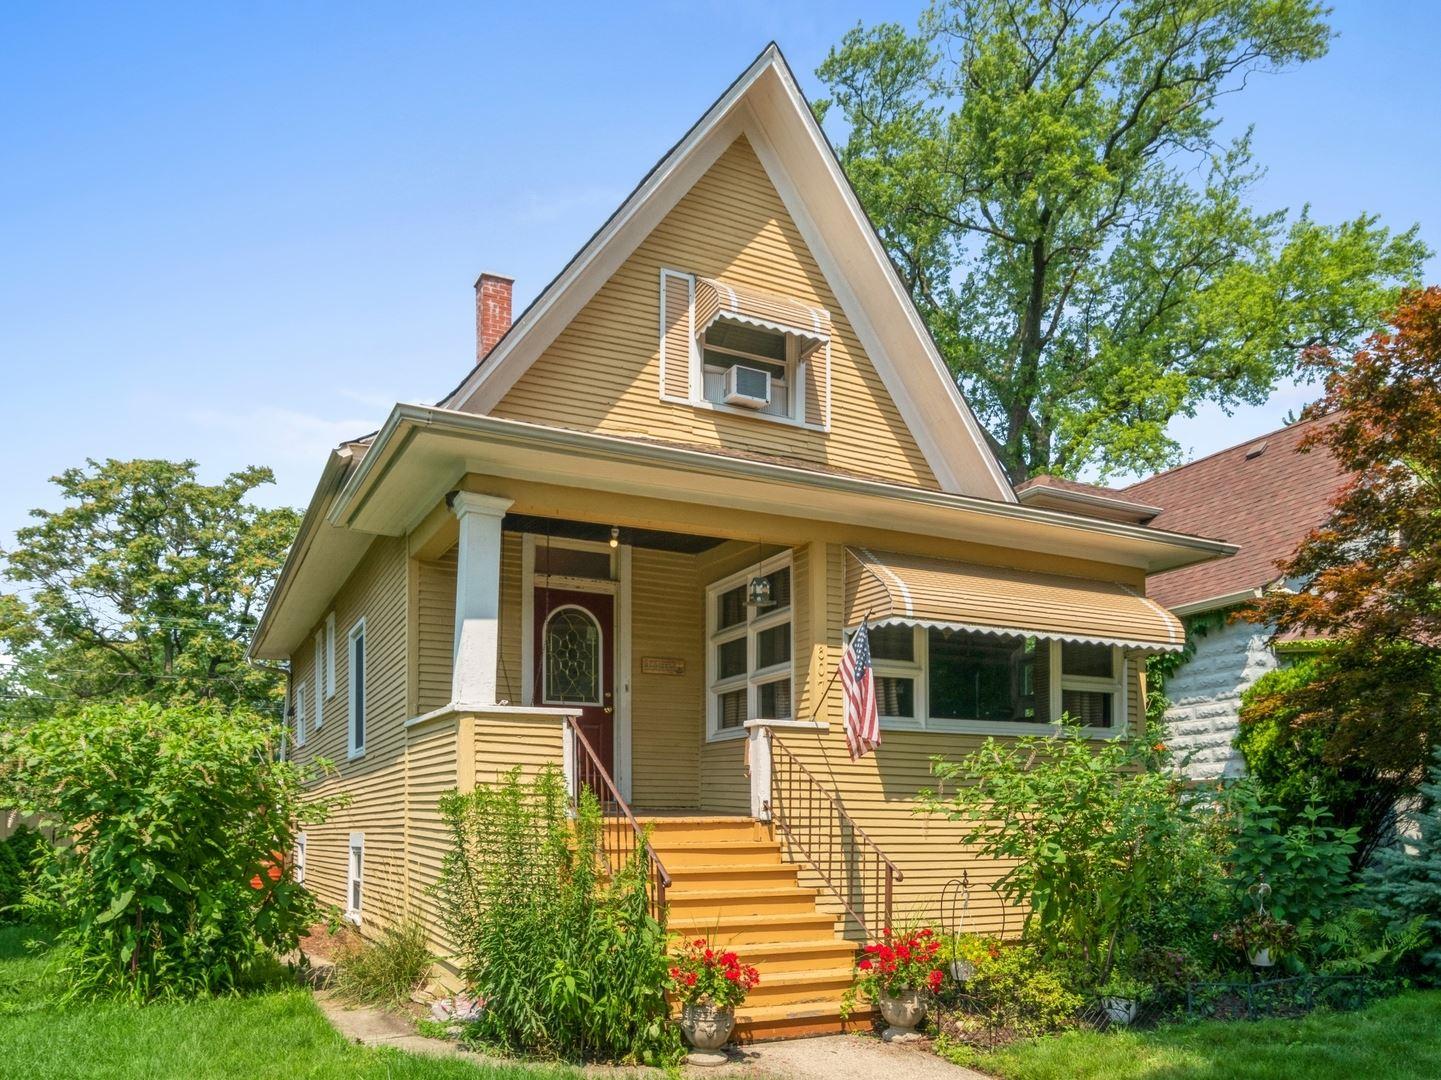 807 N Lombard Avenue, Oak Park, IL 60302 - #: 11145498